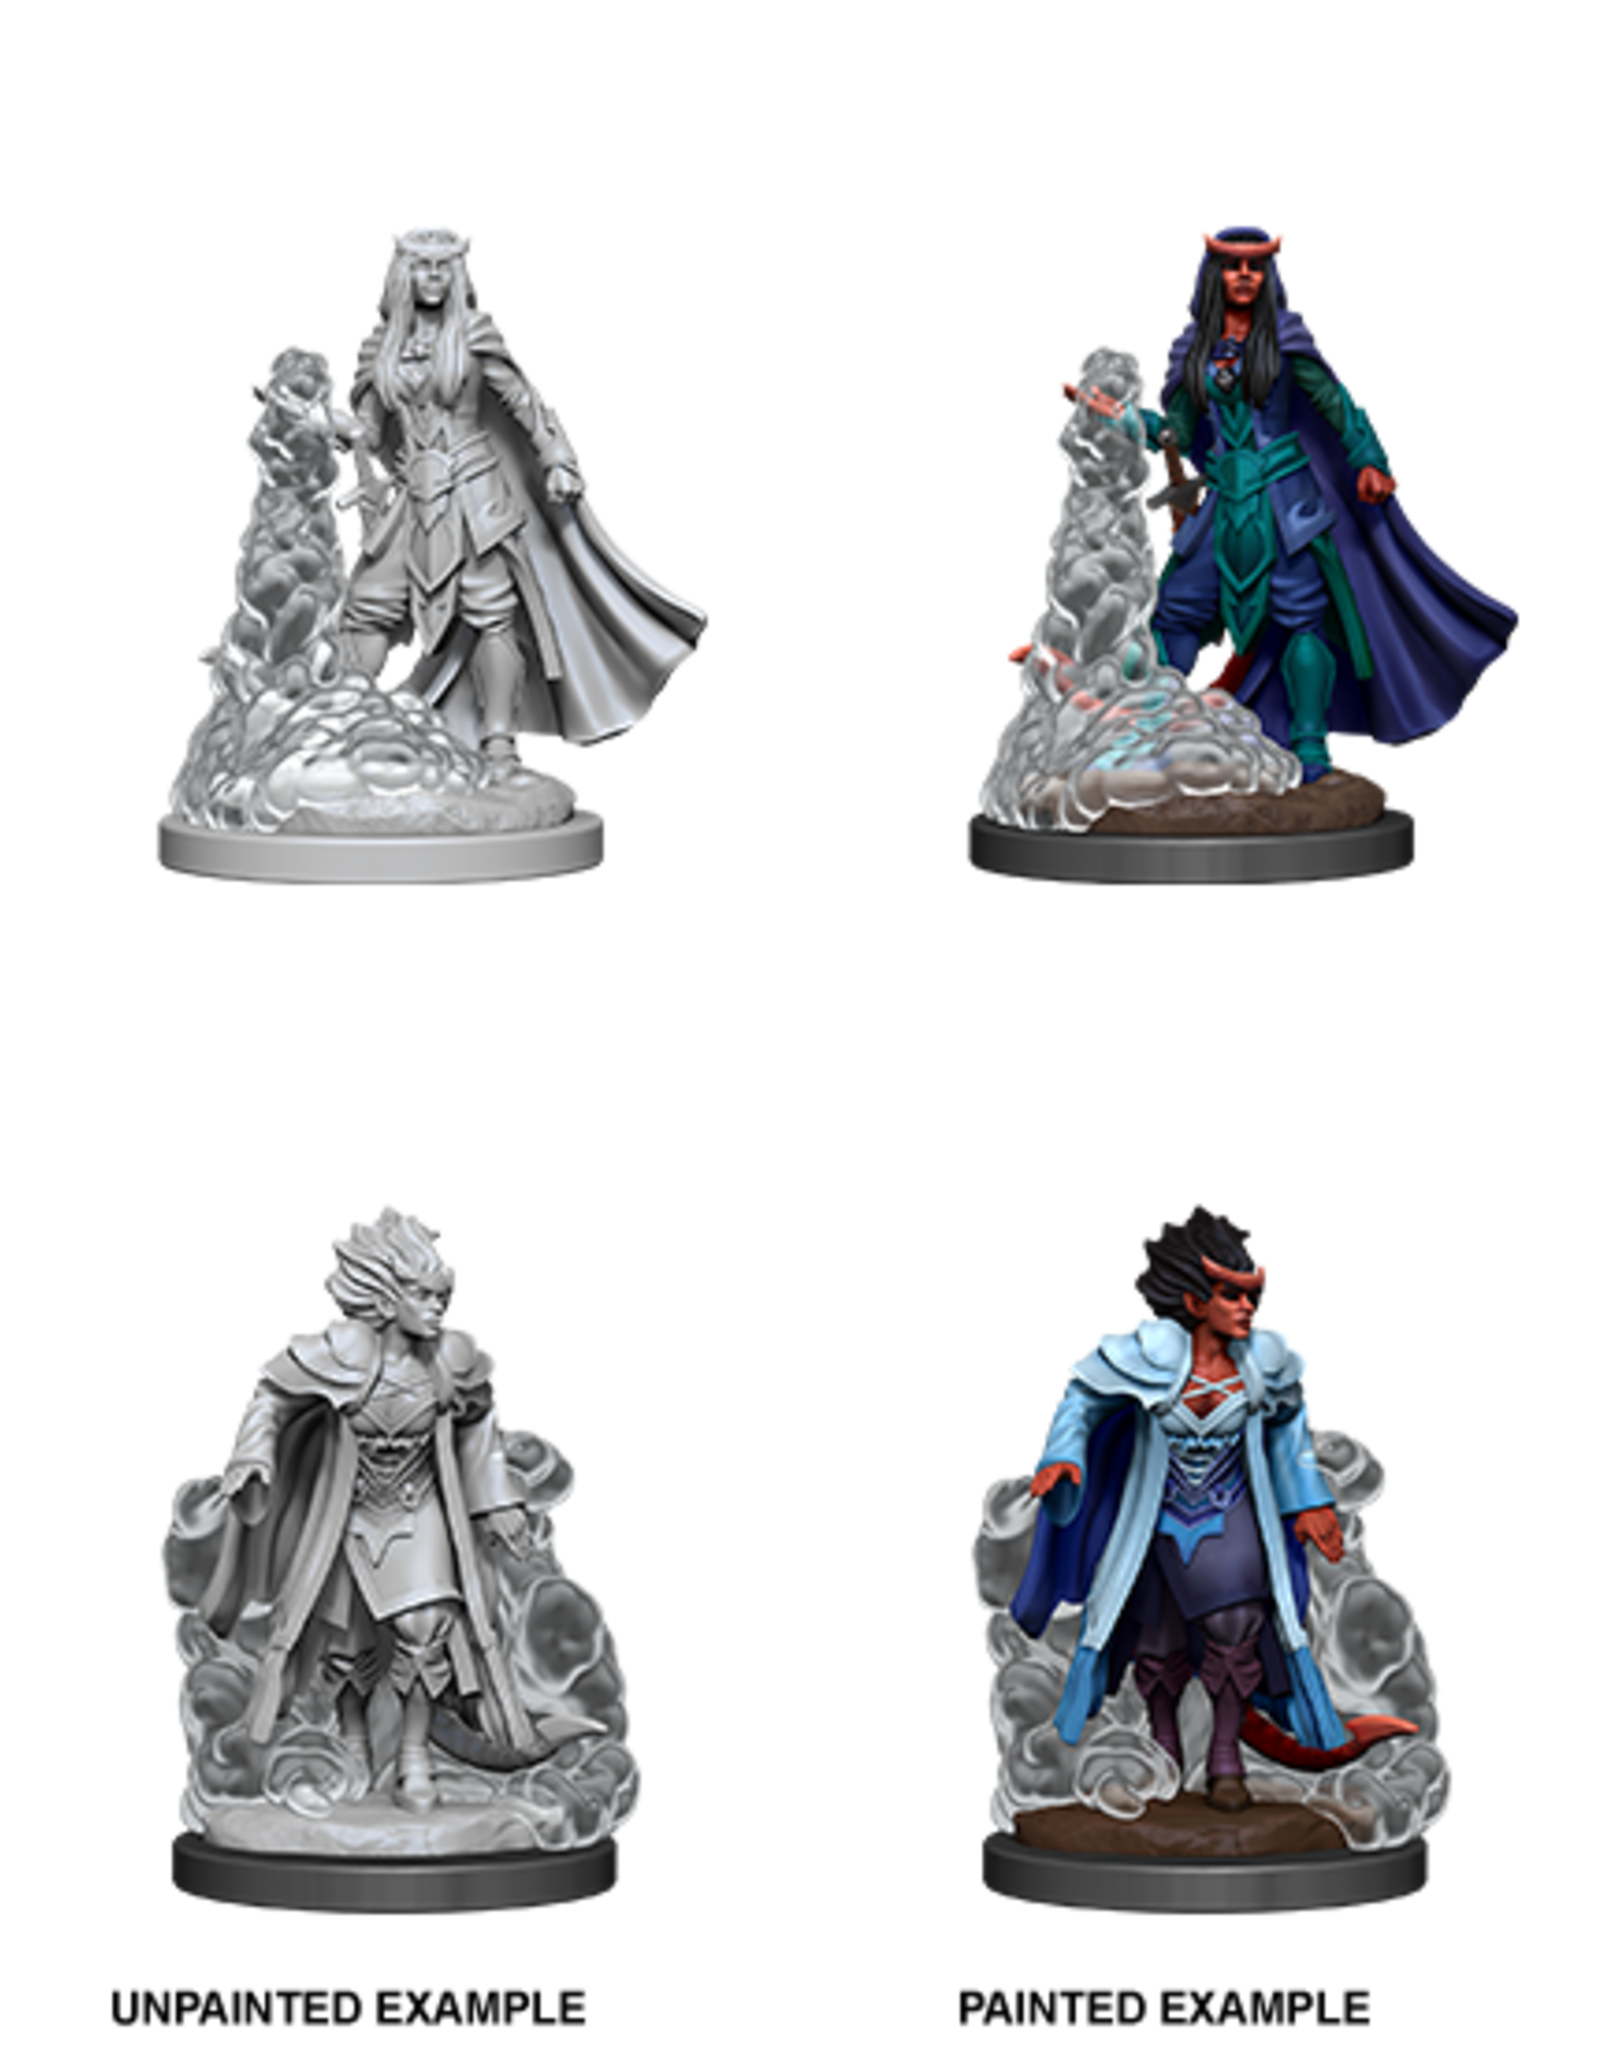 Nolzur's Marvelous Miniatures D&D D&D NMU - Female Tiefling Sorcerer (W12)